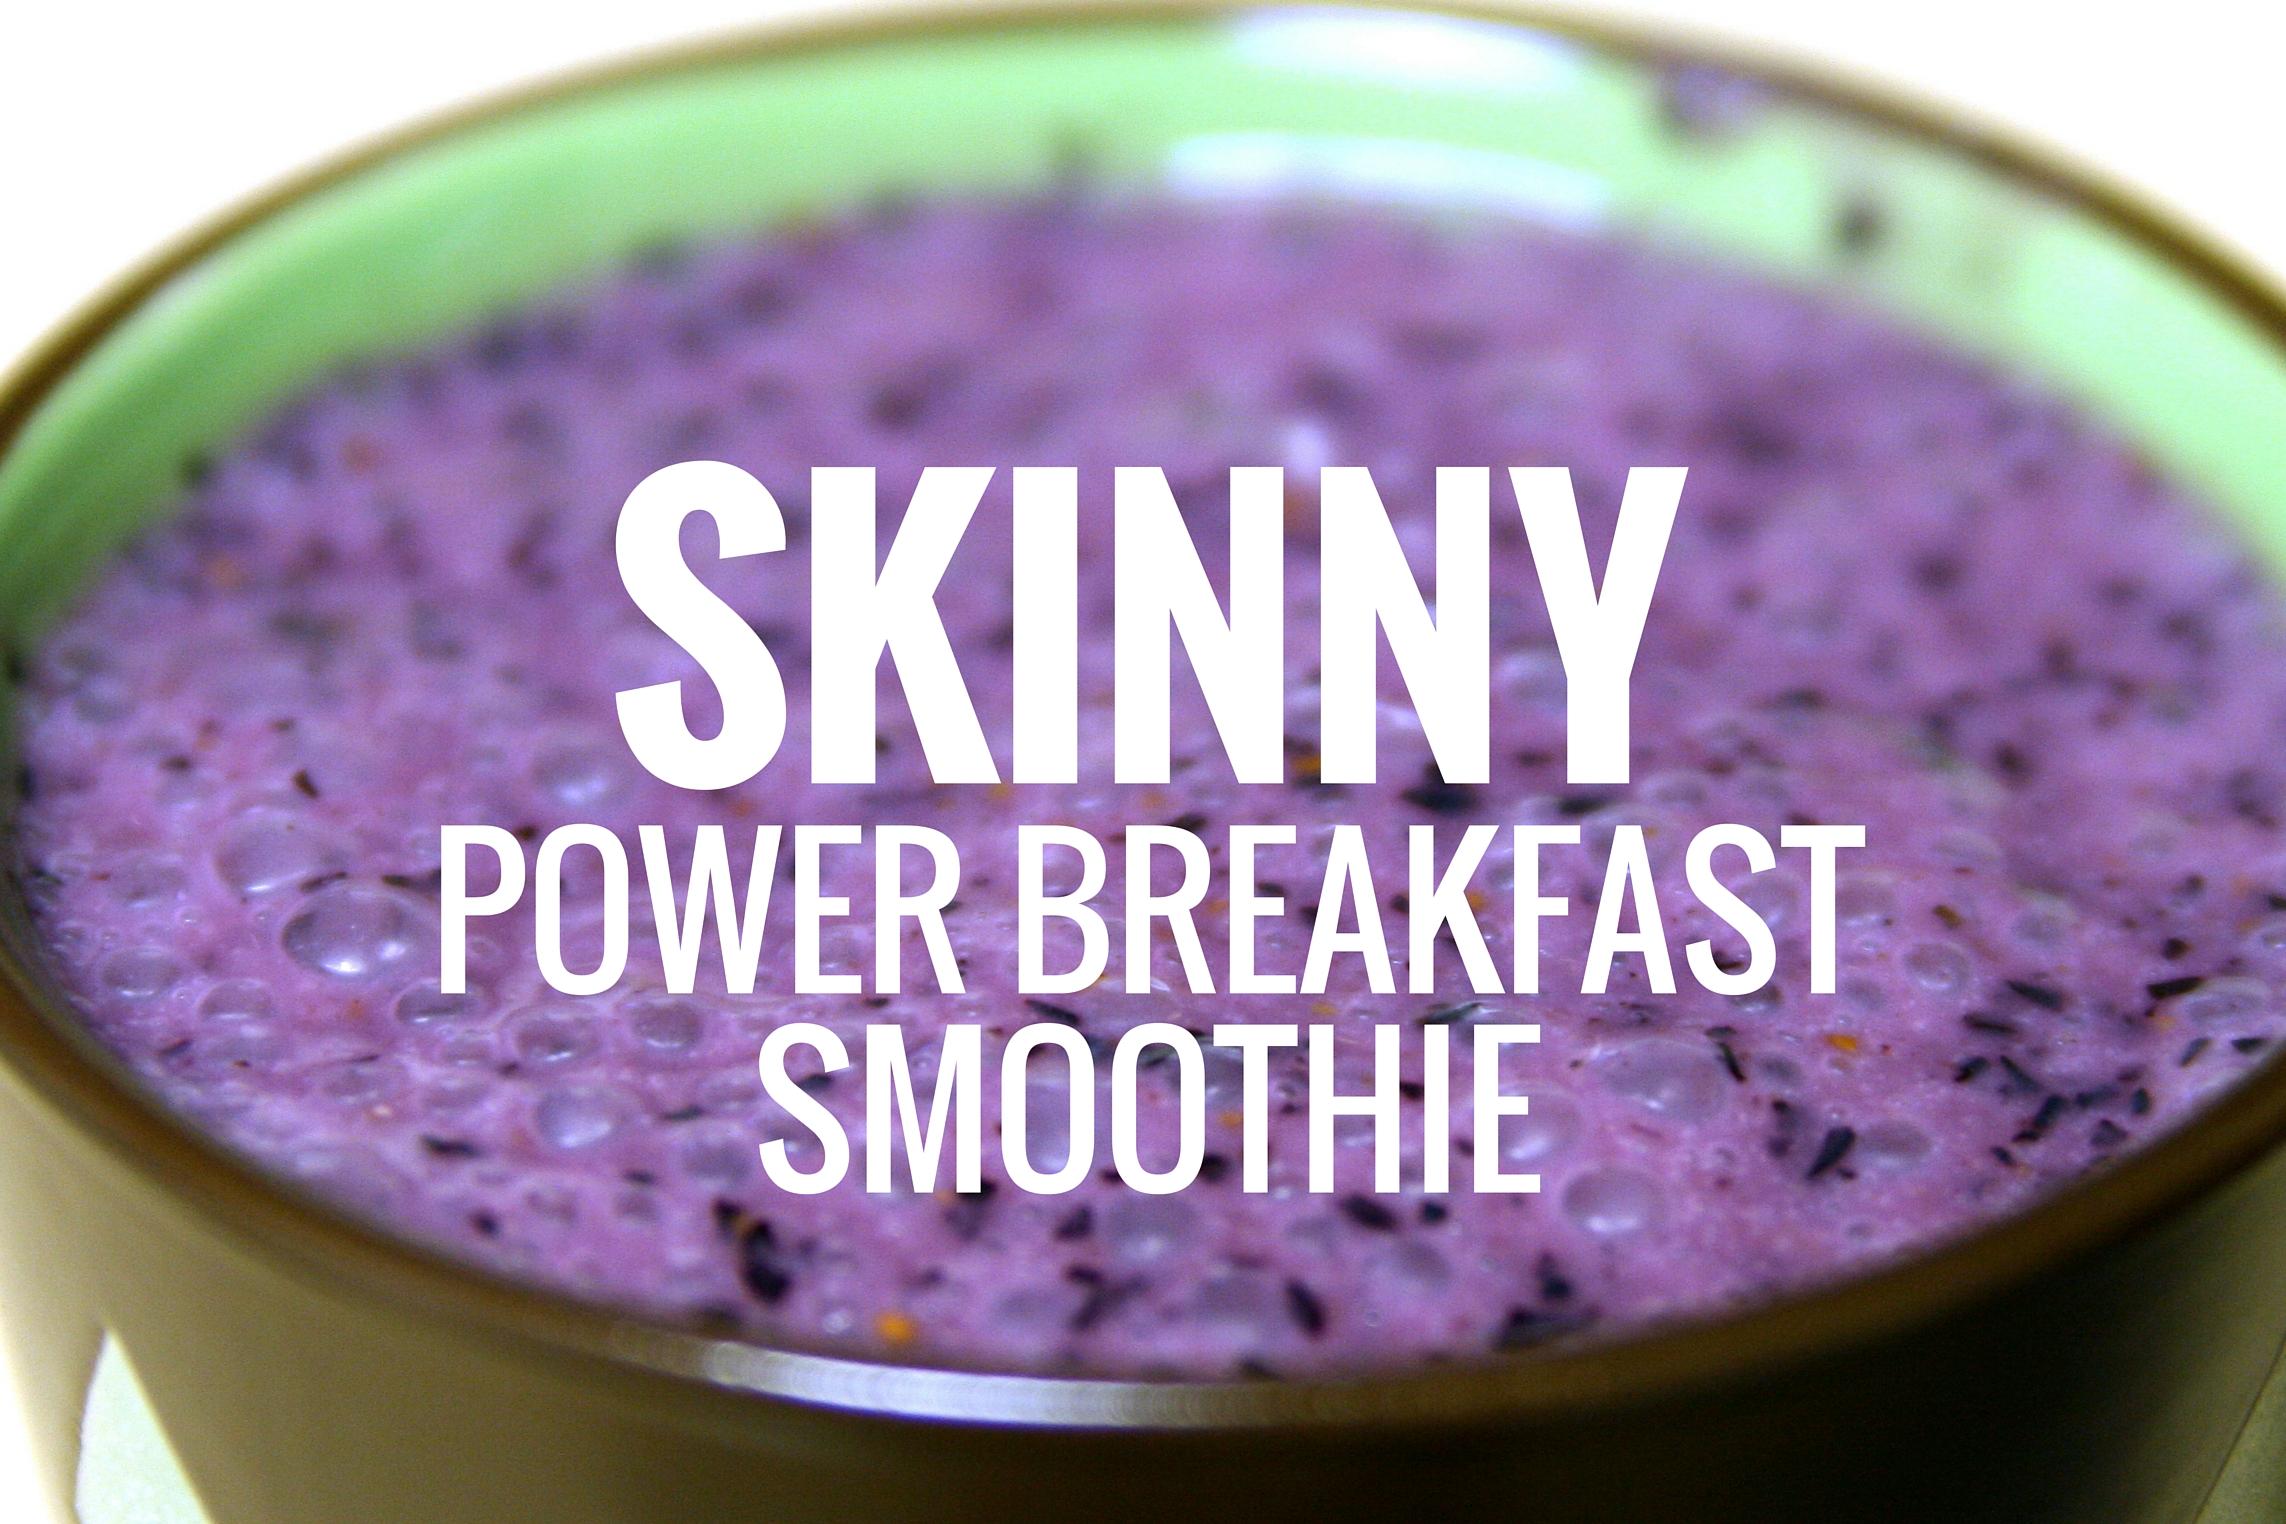 Skinny Power Breakfast Smoothie